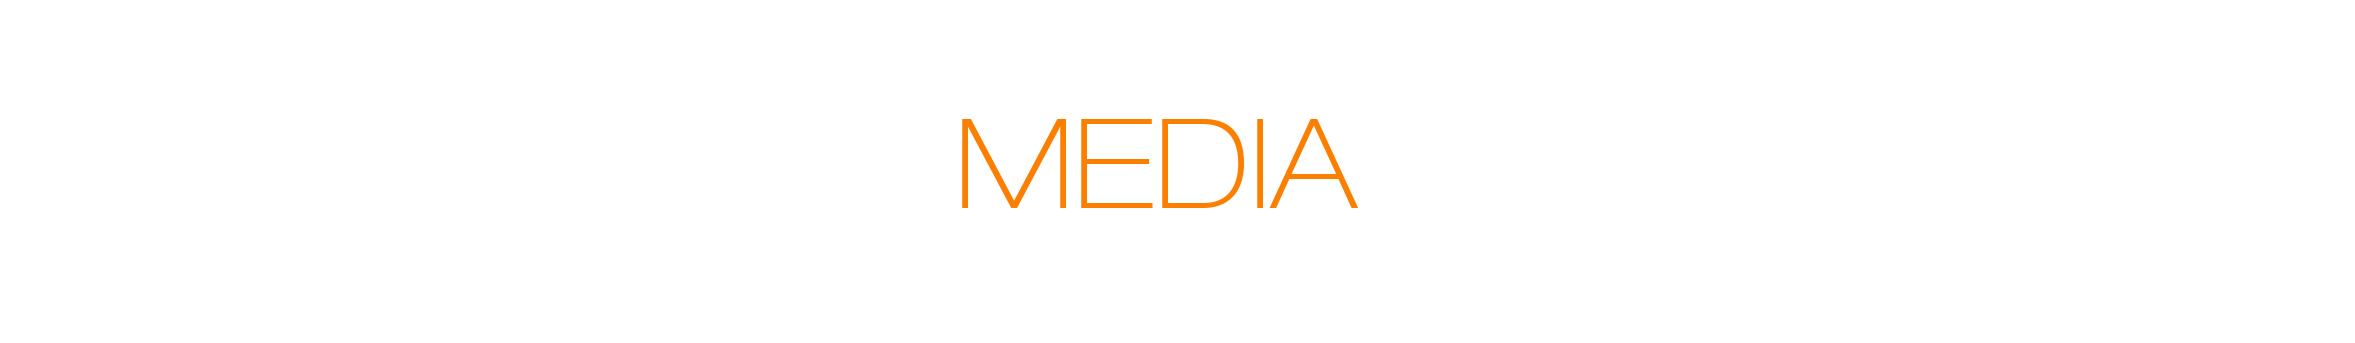 Media - 1 - Title.jpg